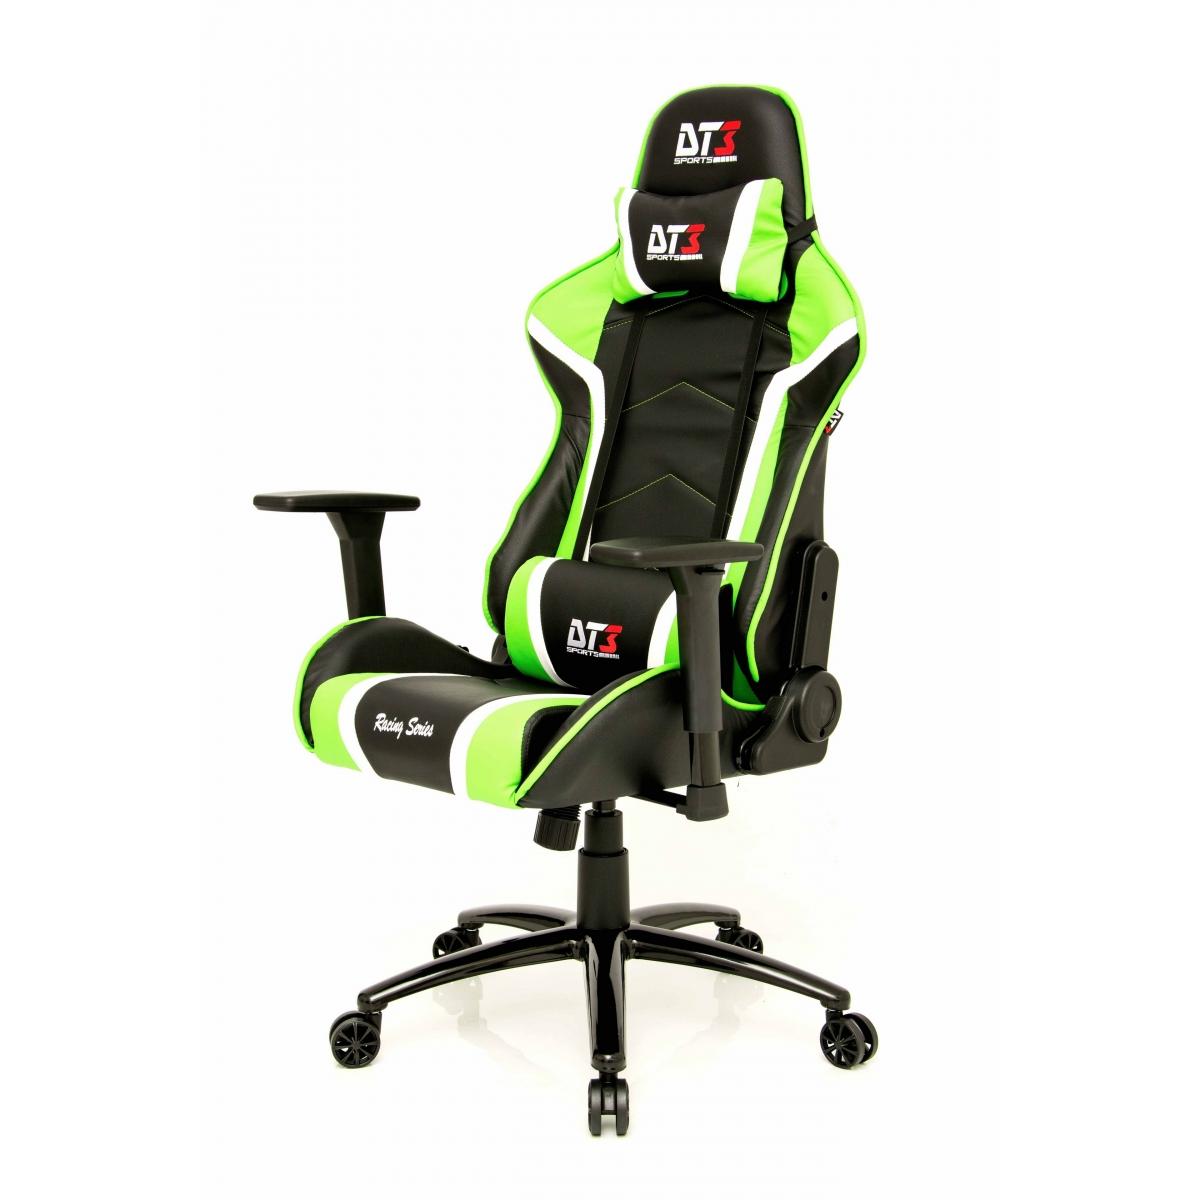 Cadeira Gamer DT3Sports Modena, Black-Green